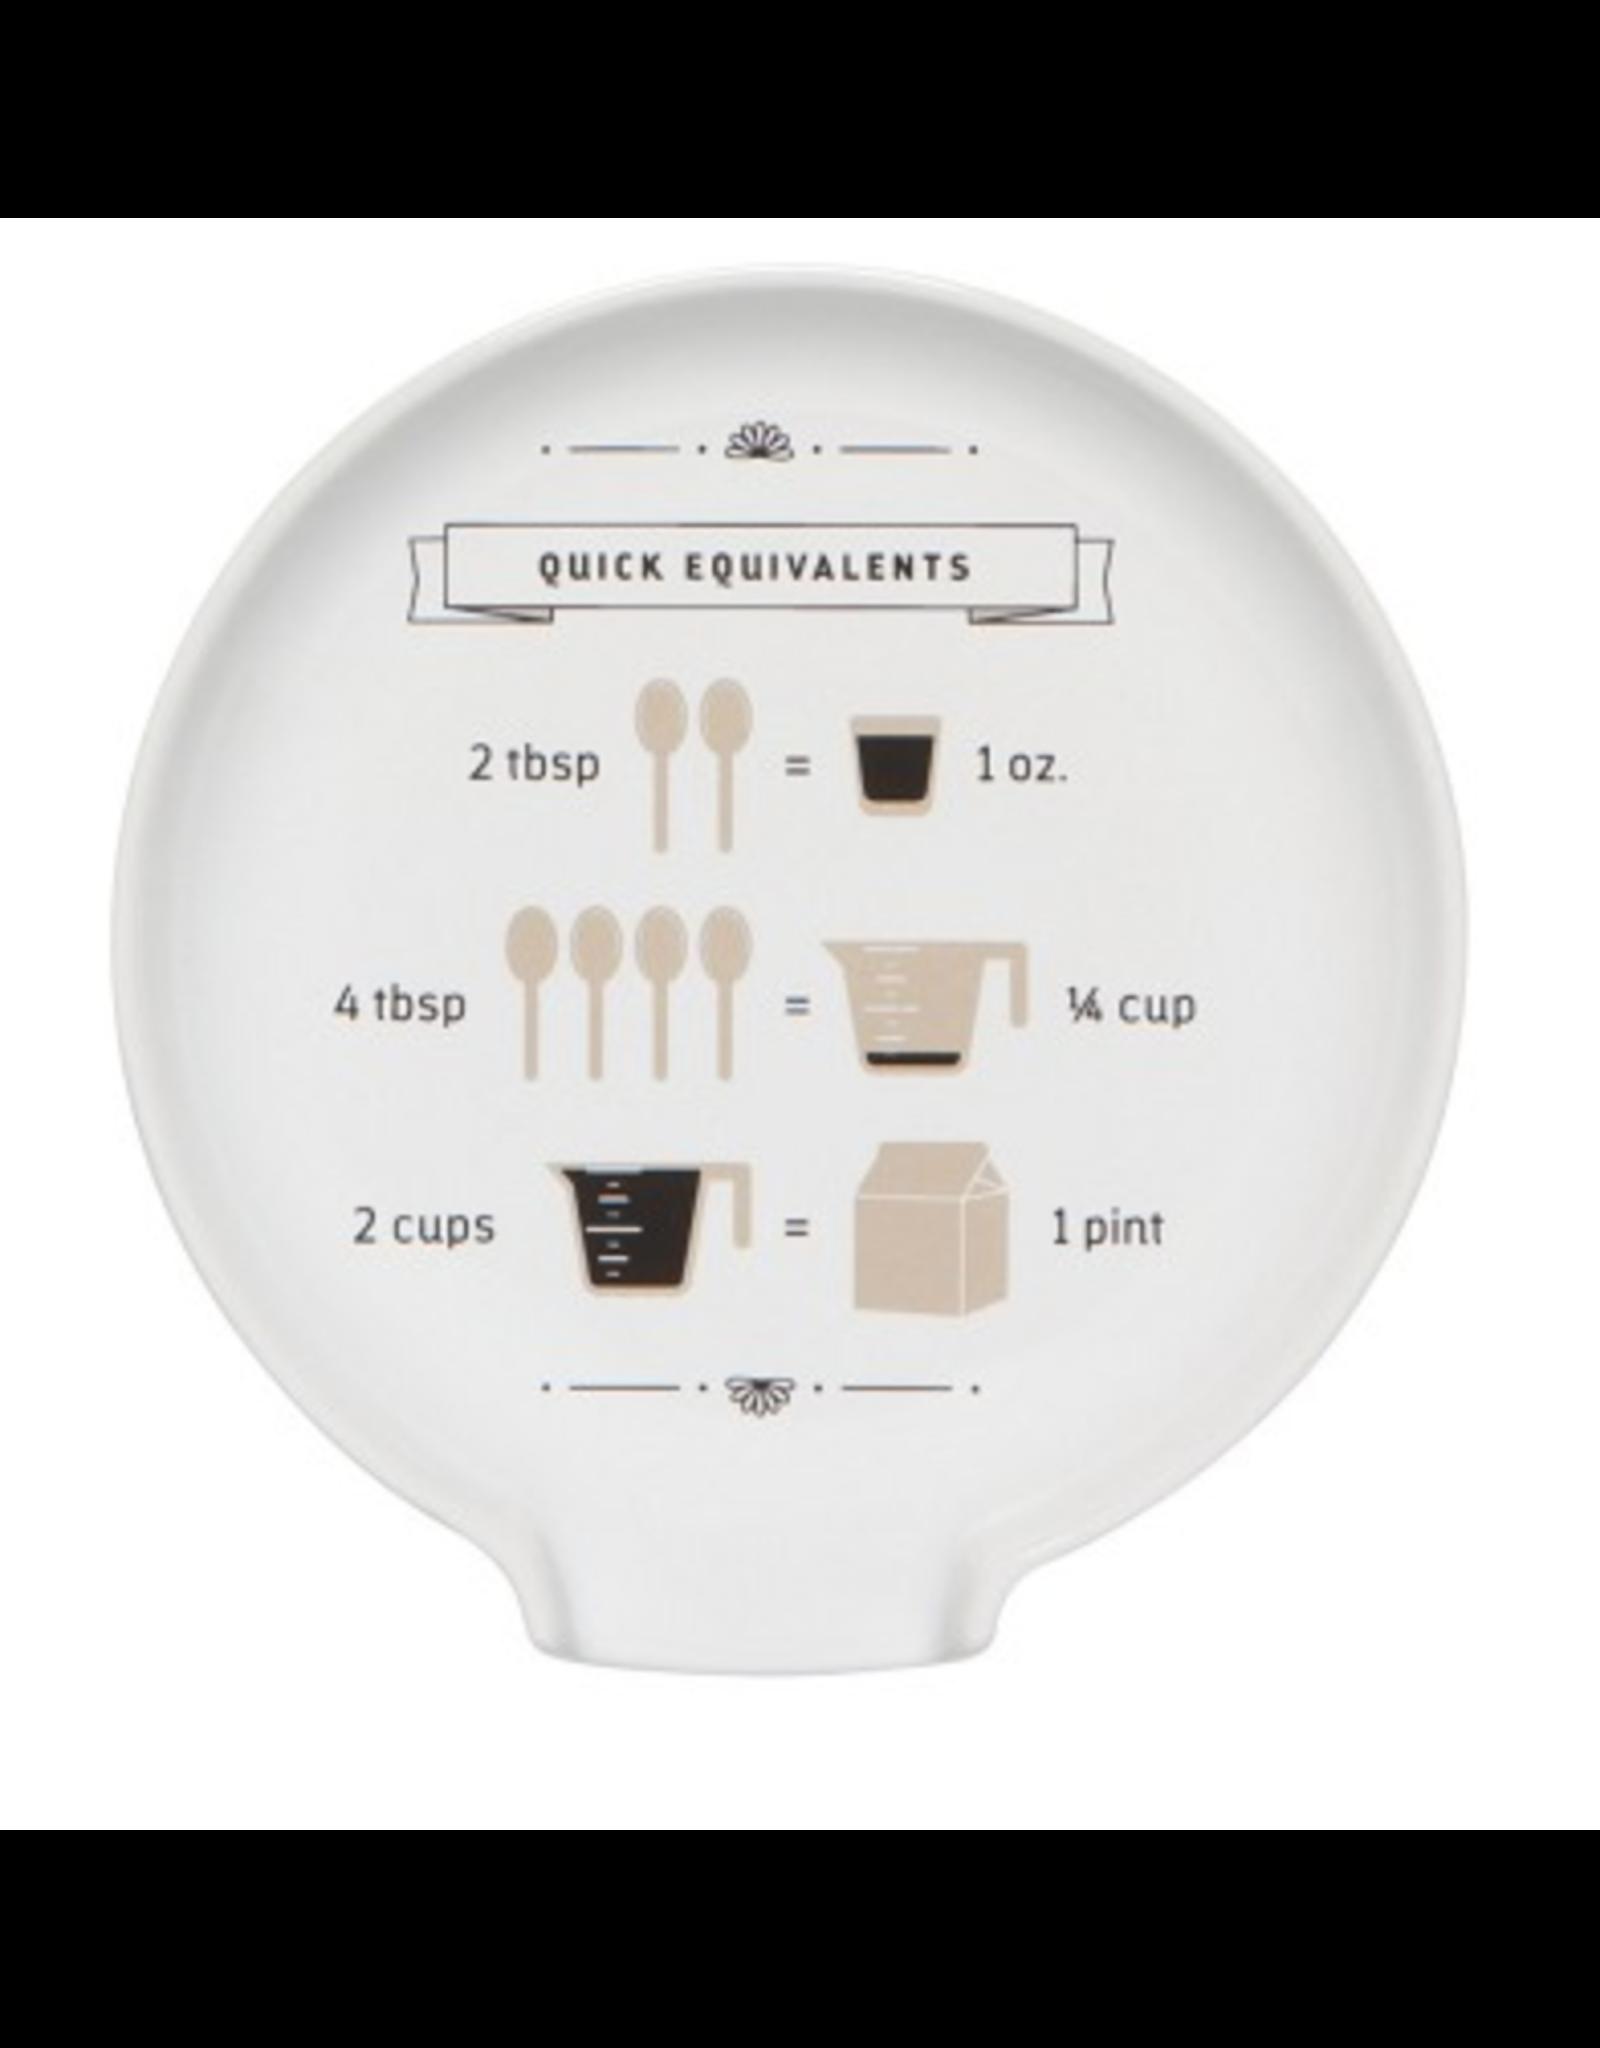 Spoon Rest Kitchen Conversions